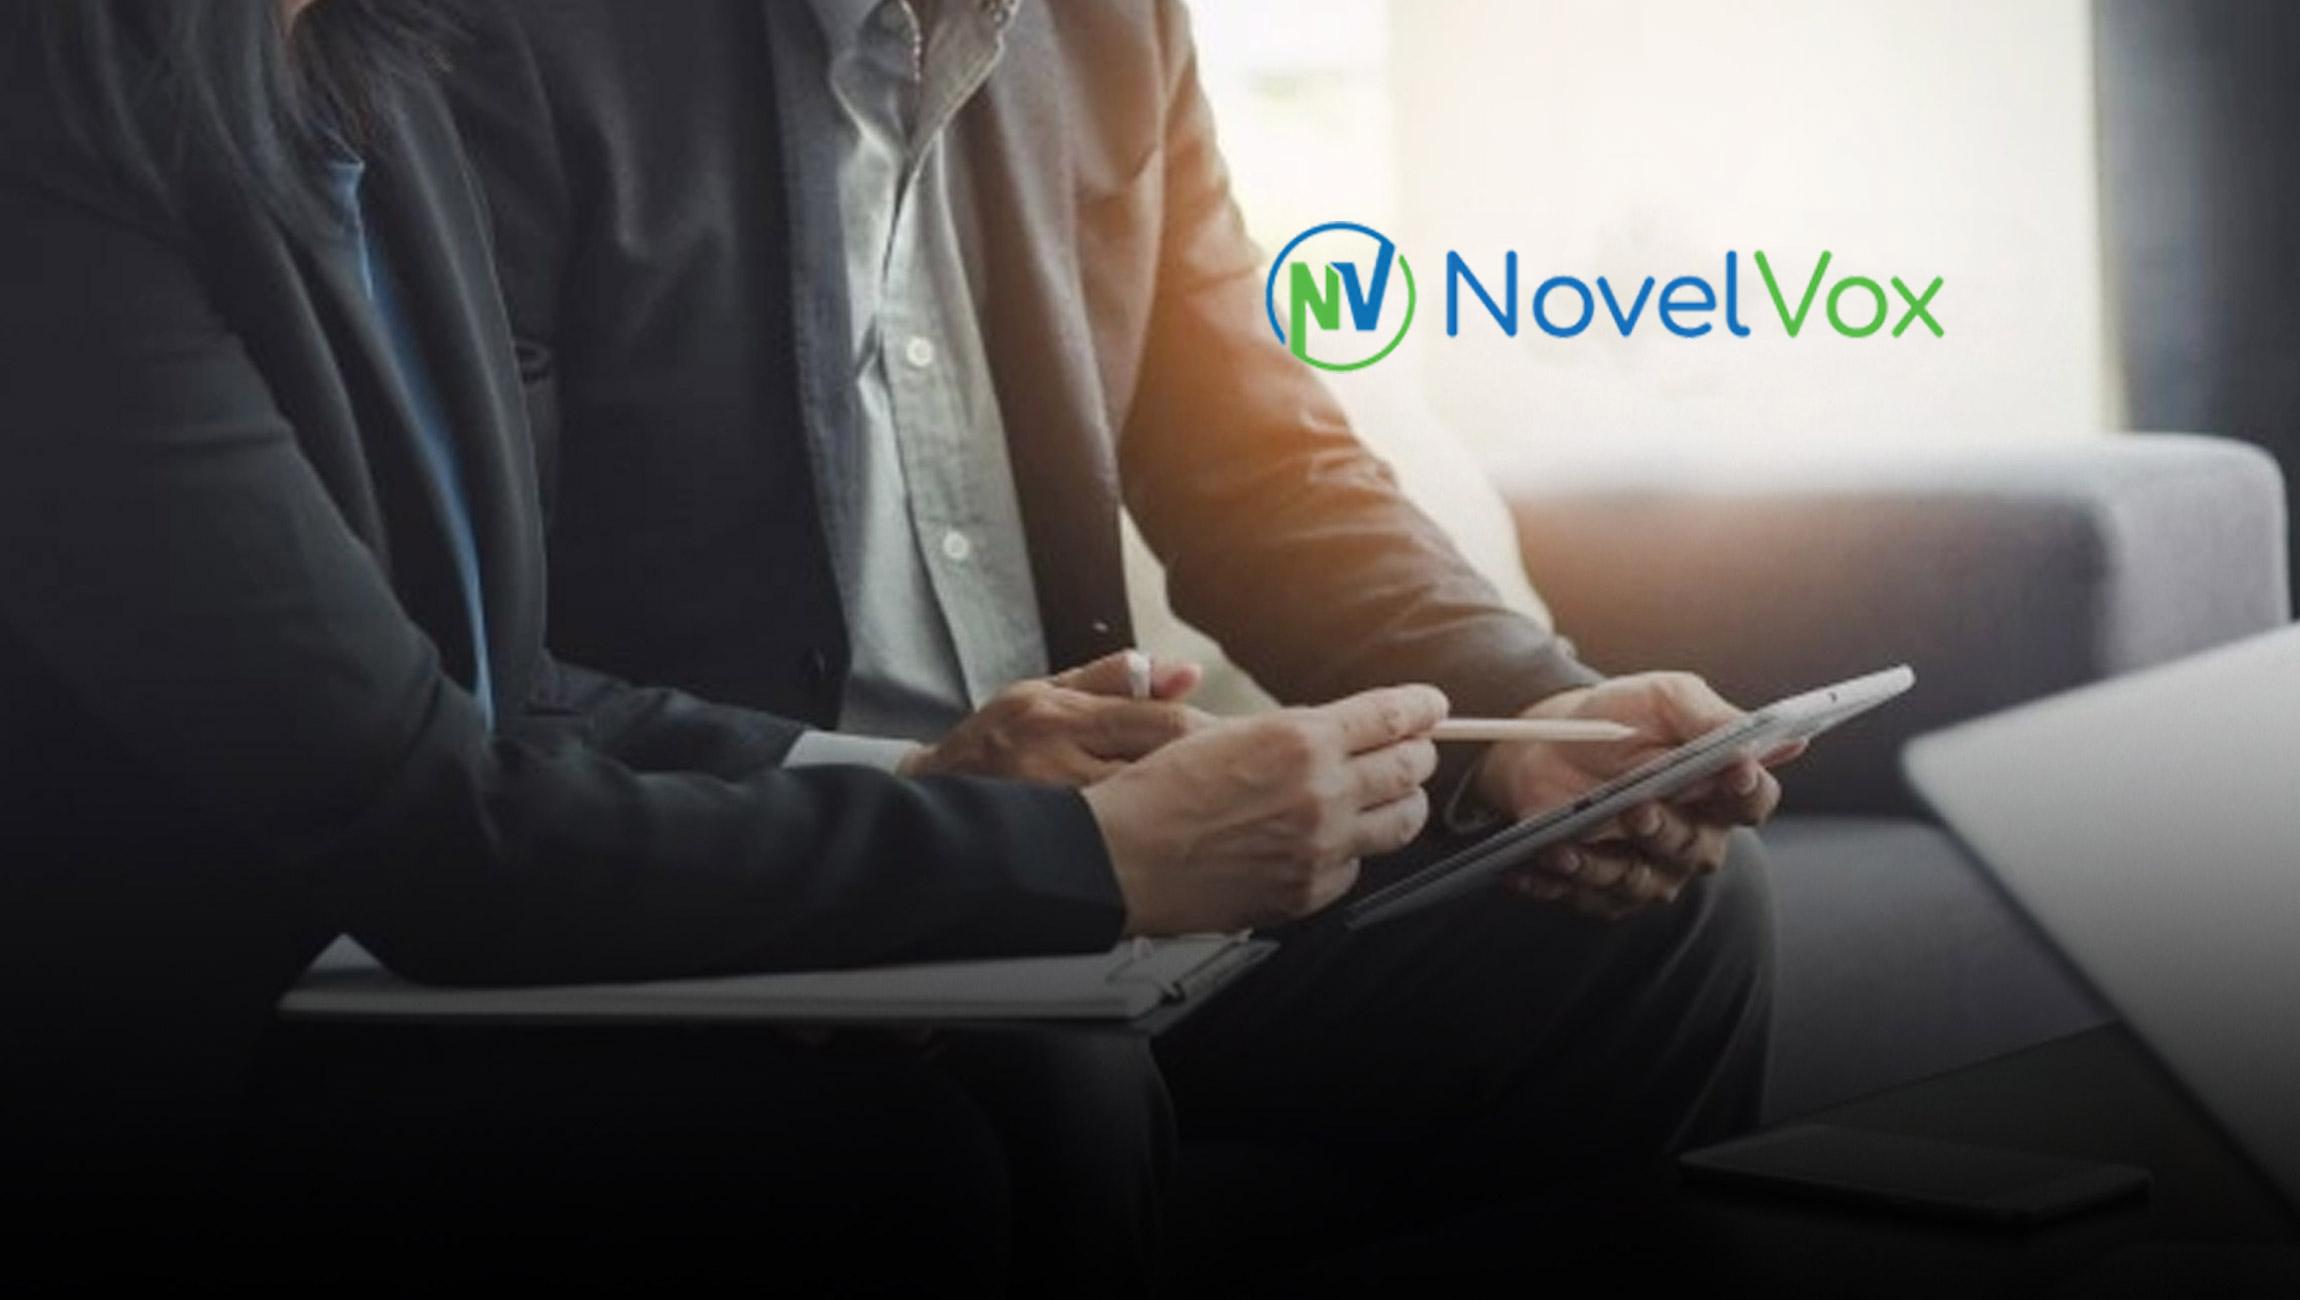 NovelVox-Introduces-A-New-Range-Of-Cloud-Based-CTI-Connectors